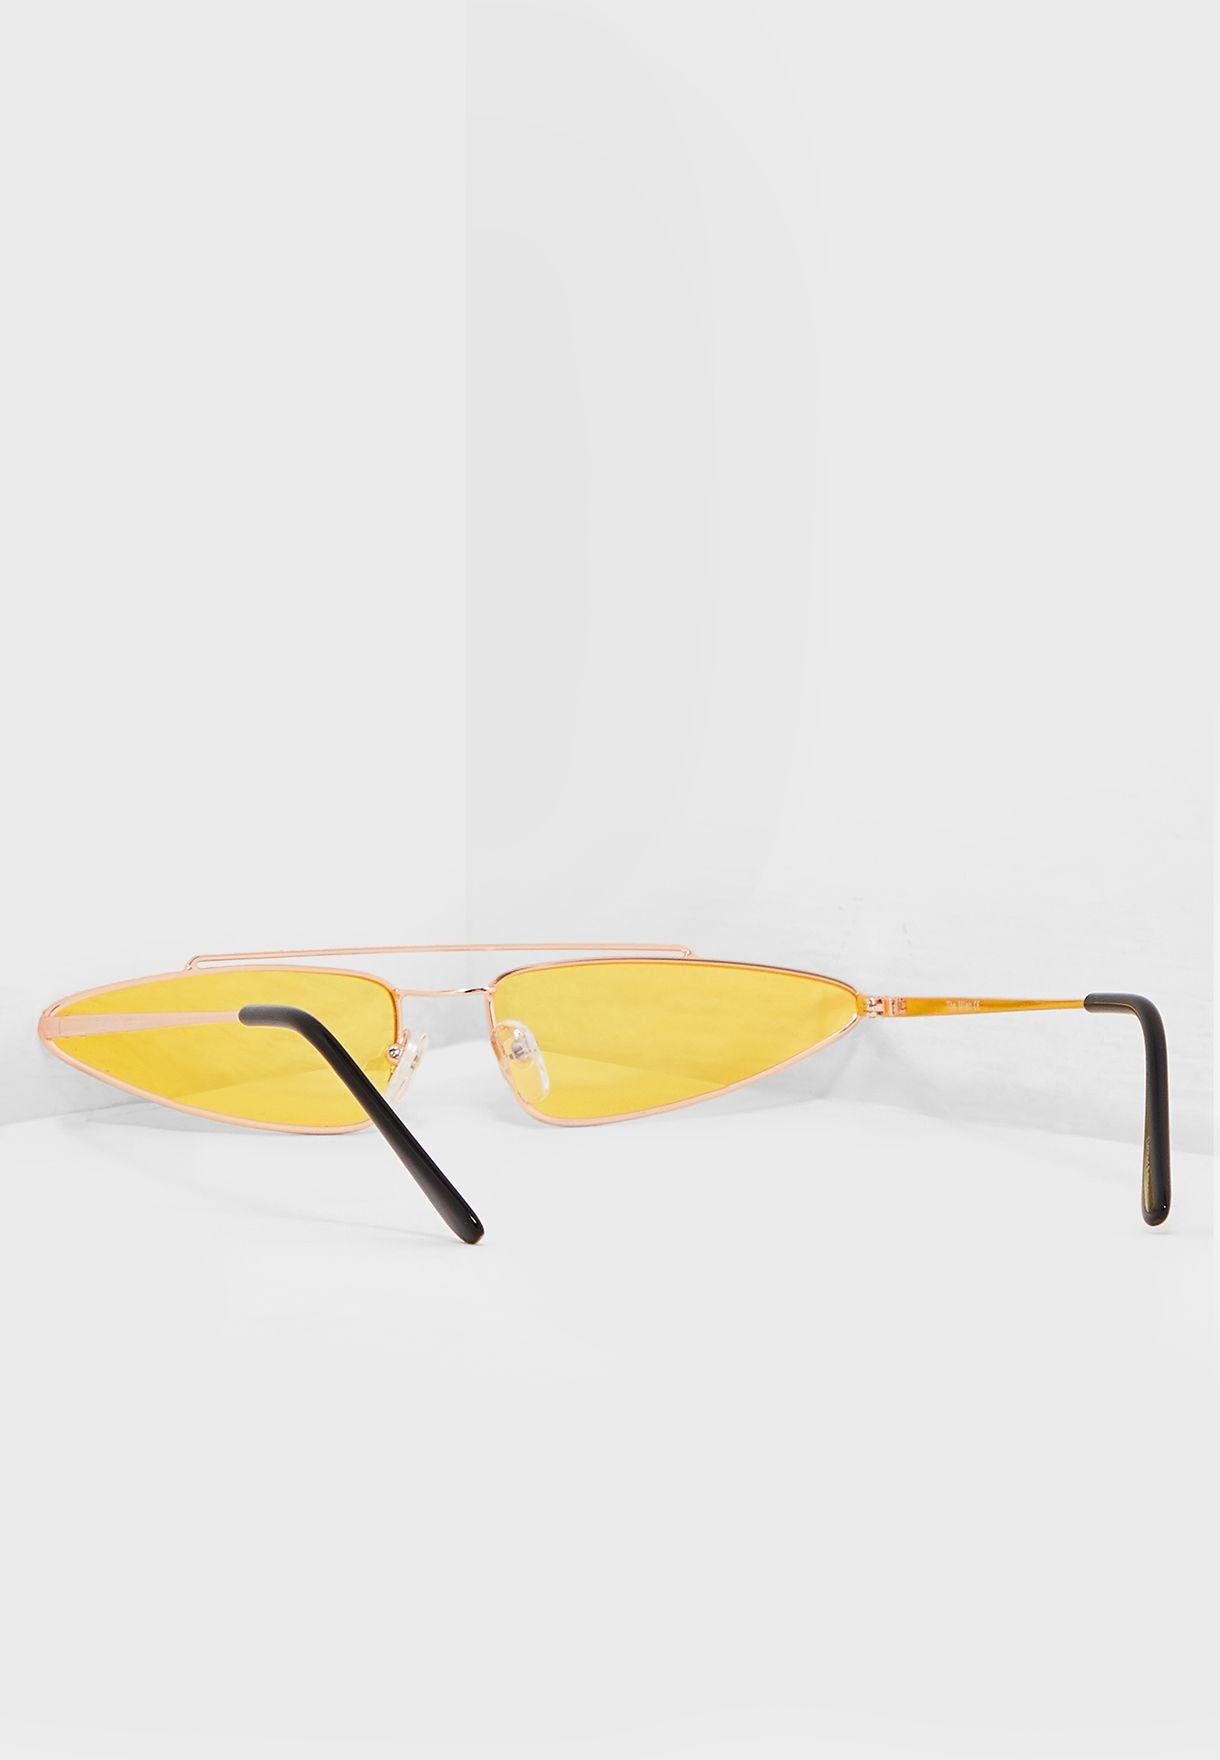 The Milan Cateye Sunglasses